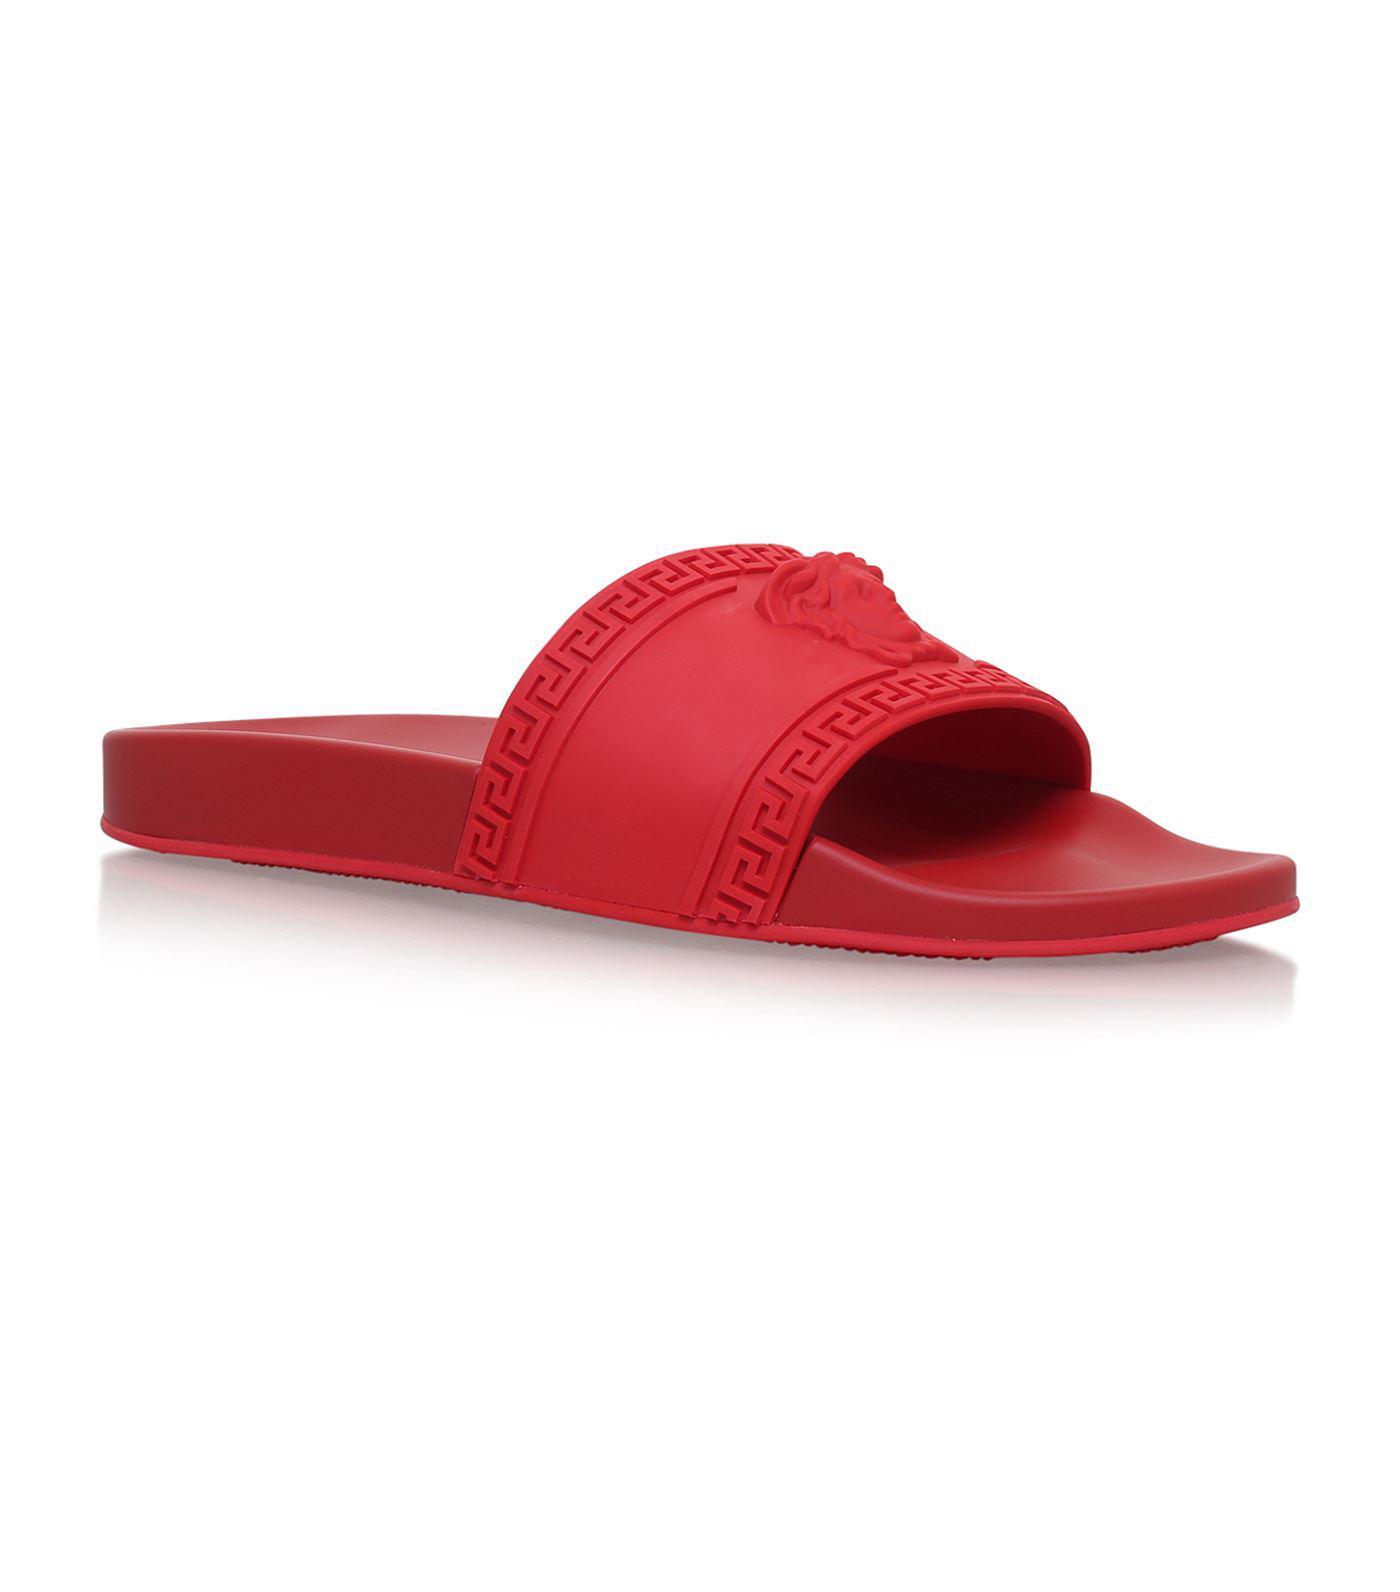 Harrods Shoes Brands